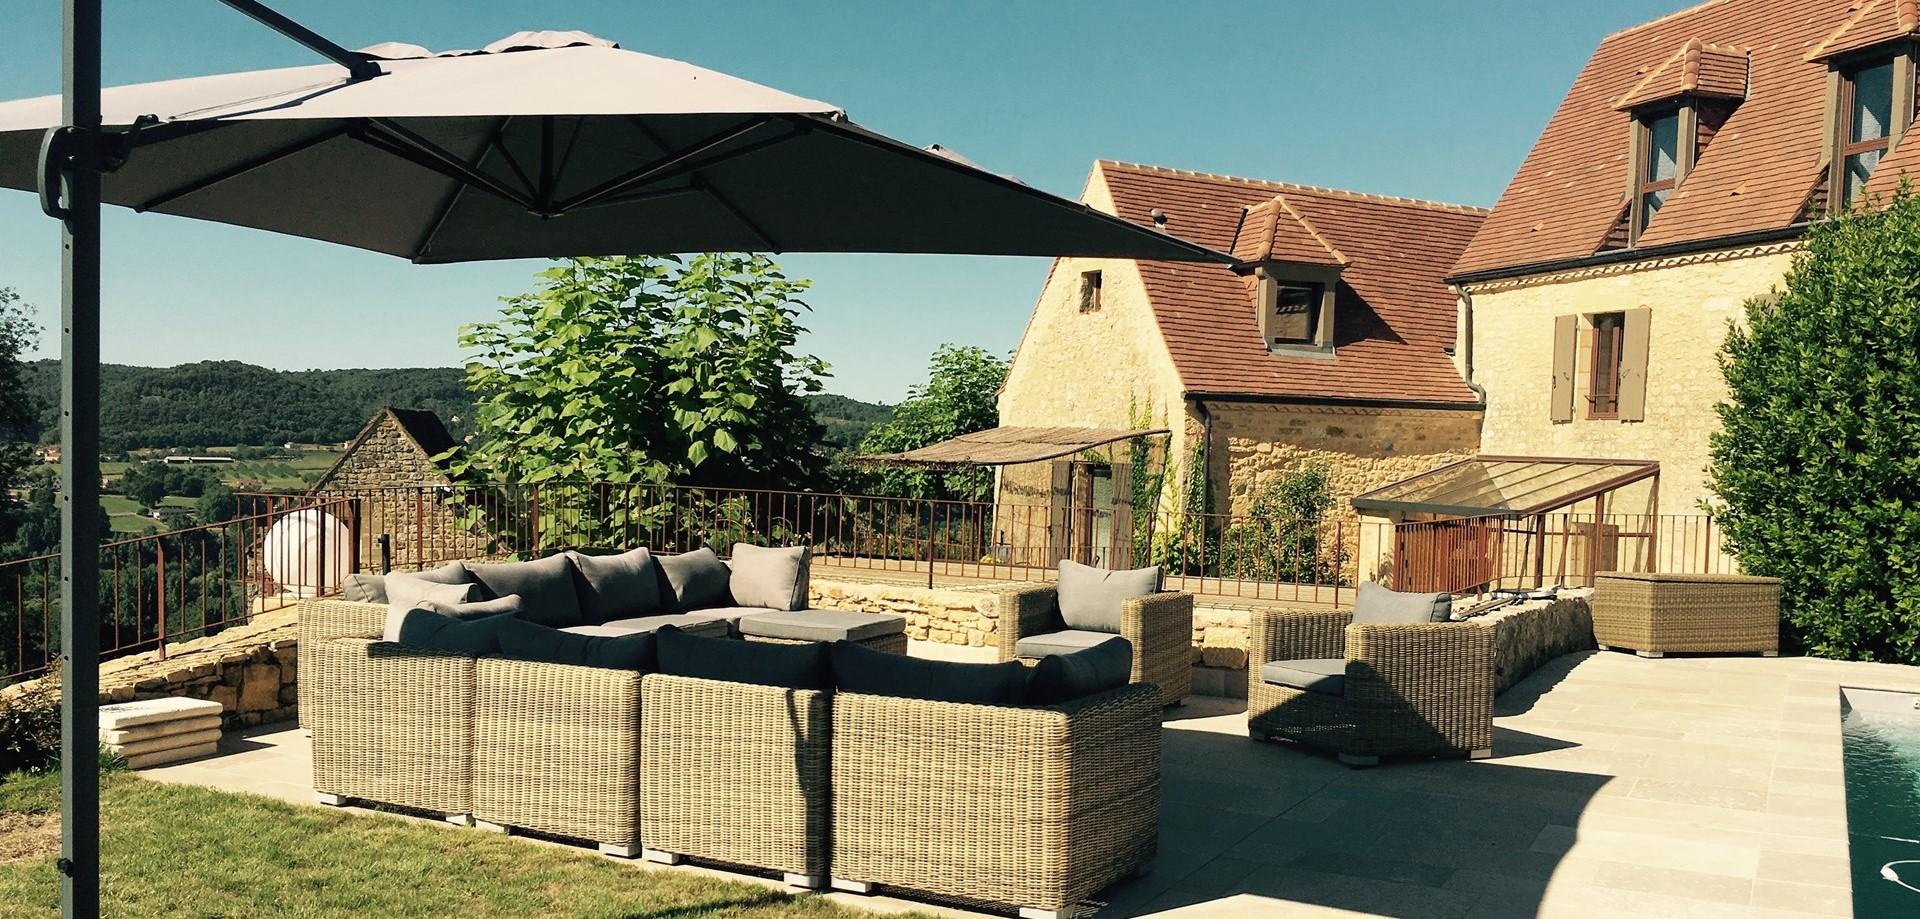 sunny-terrace-le-village-dordogne